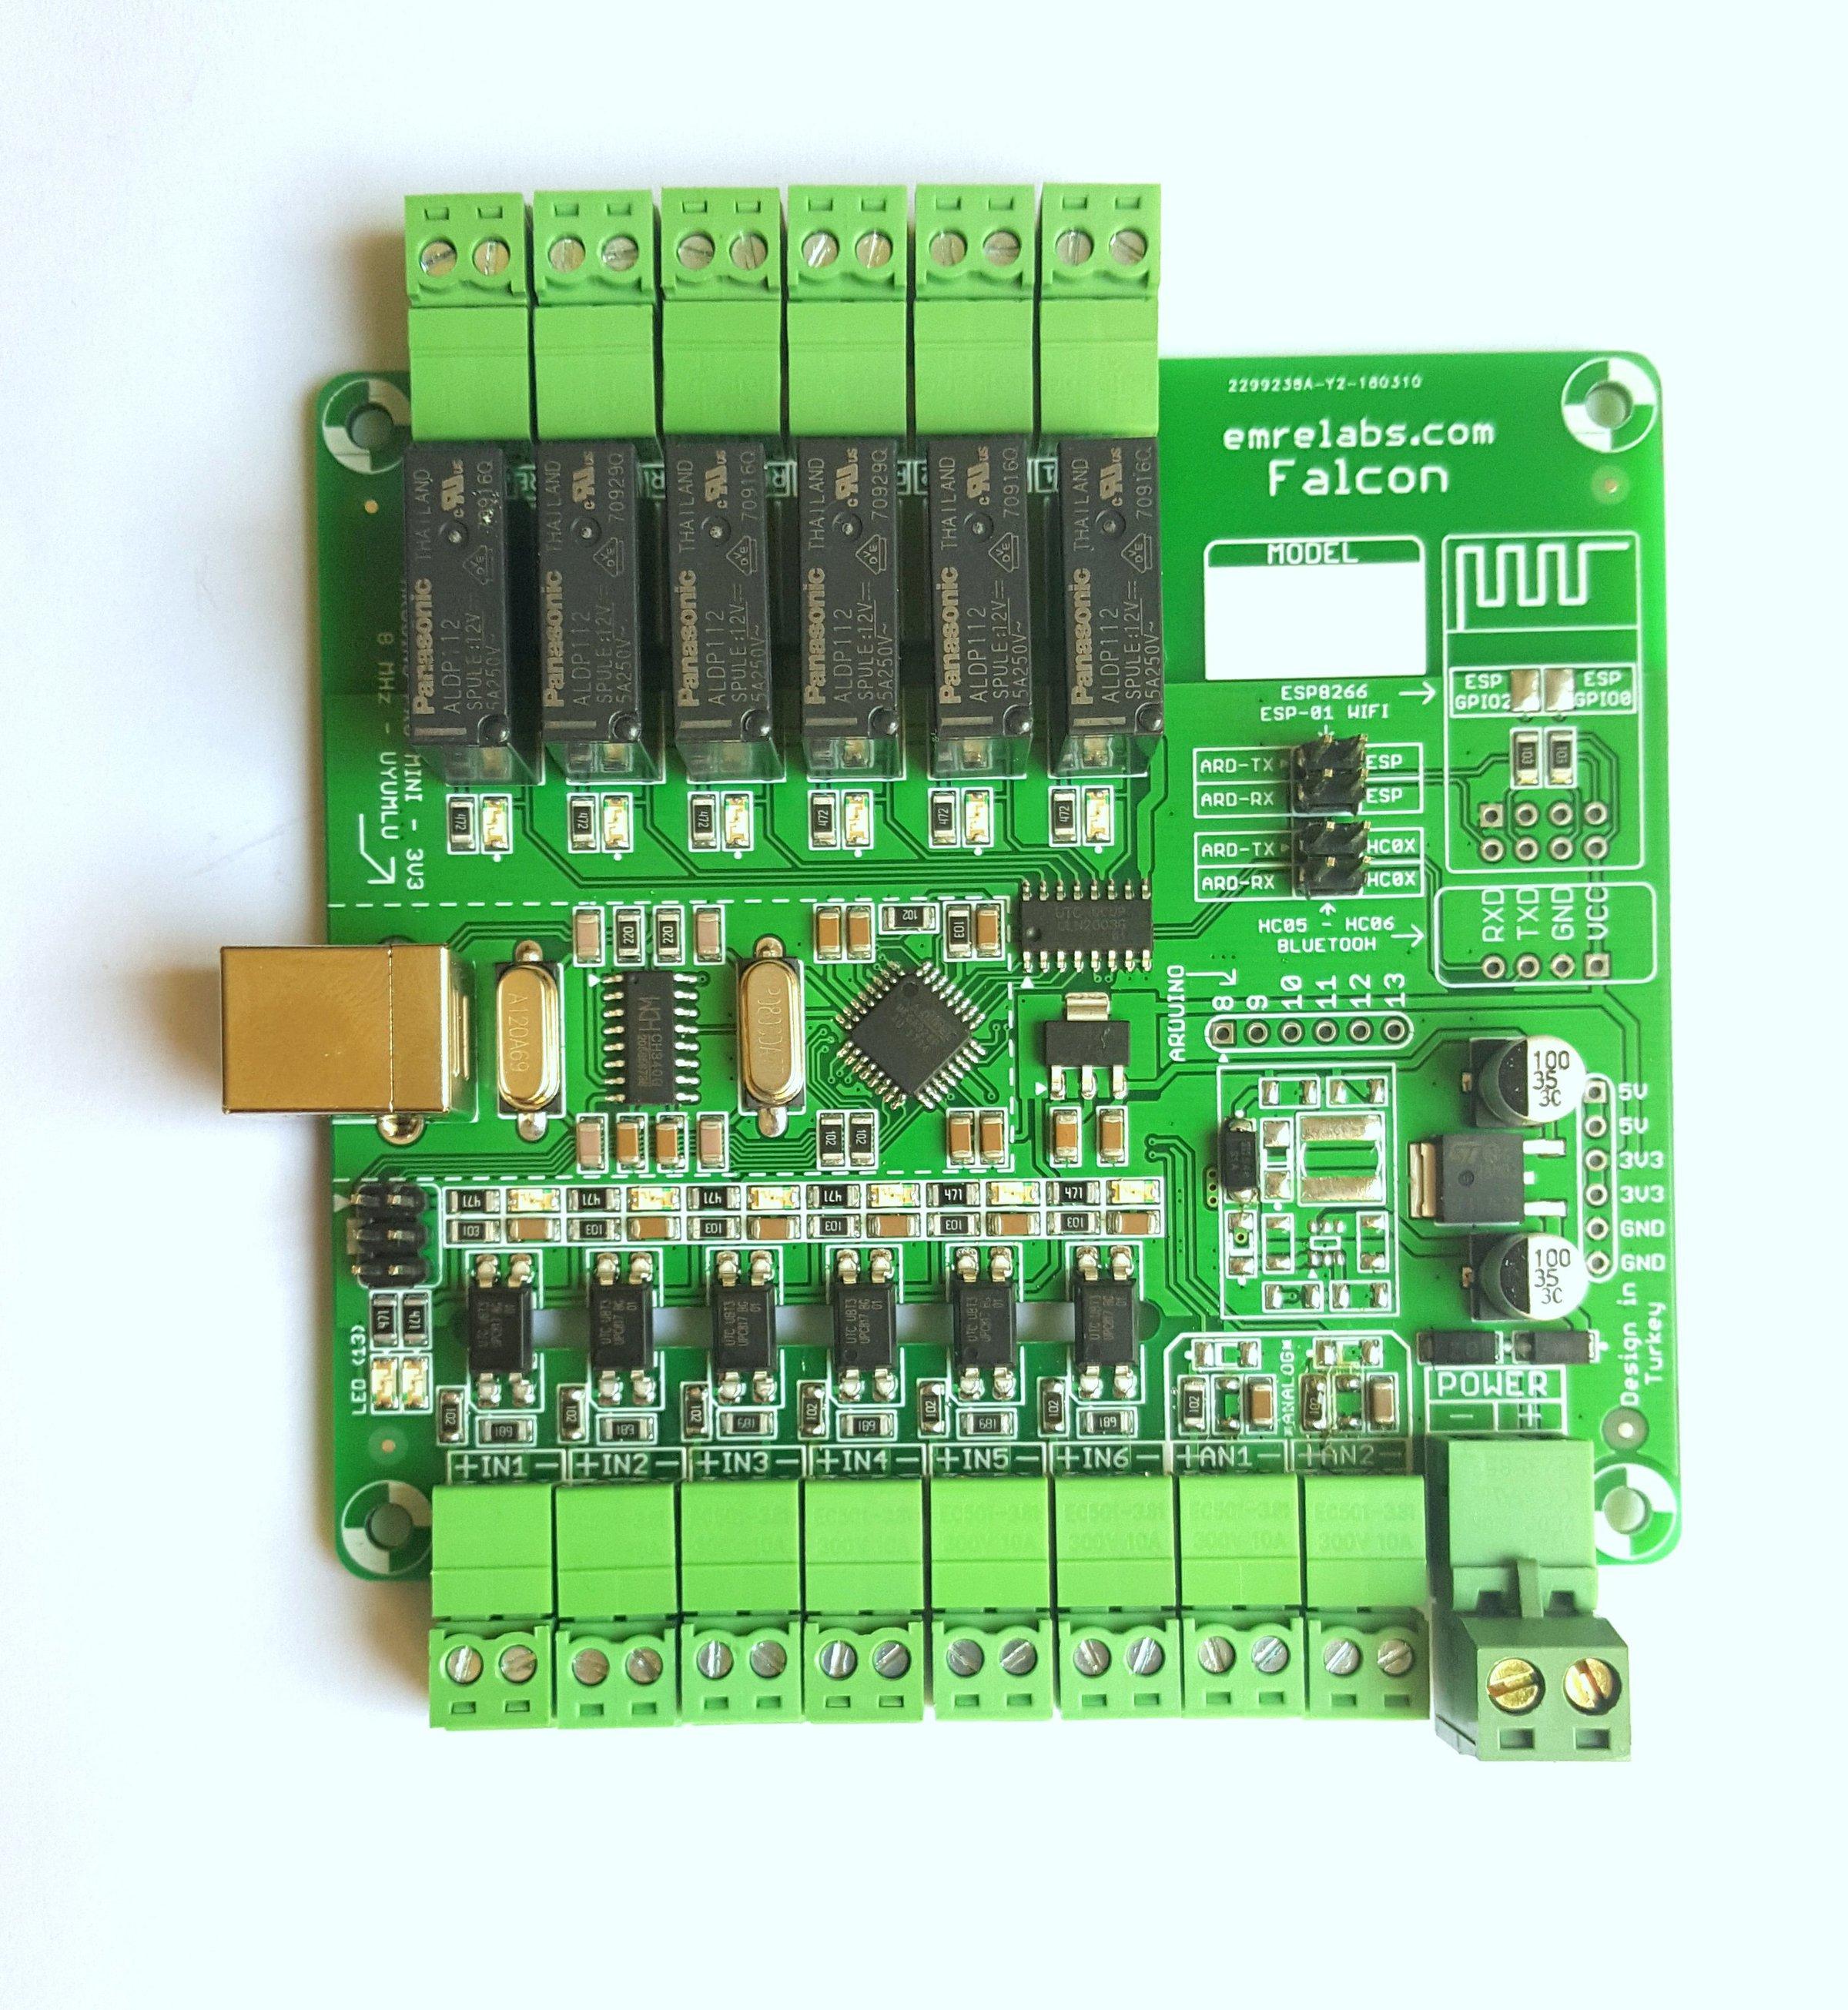 Arduino falcon industrial control board from emrelabs on